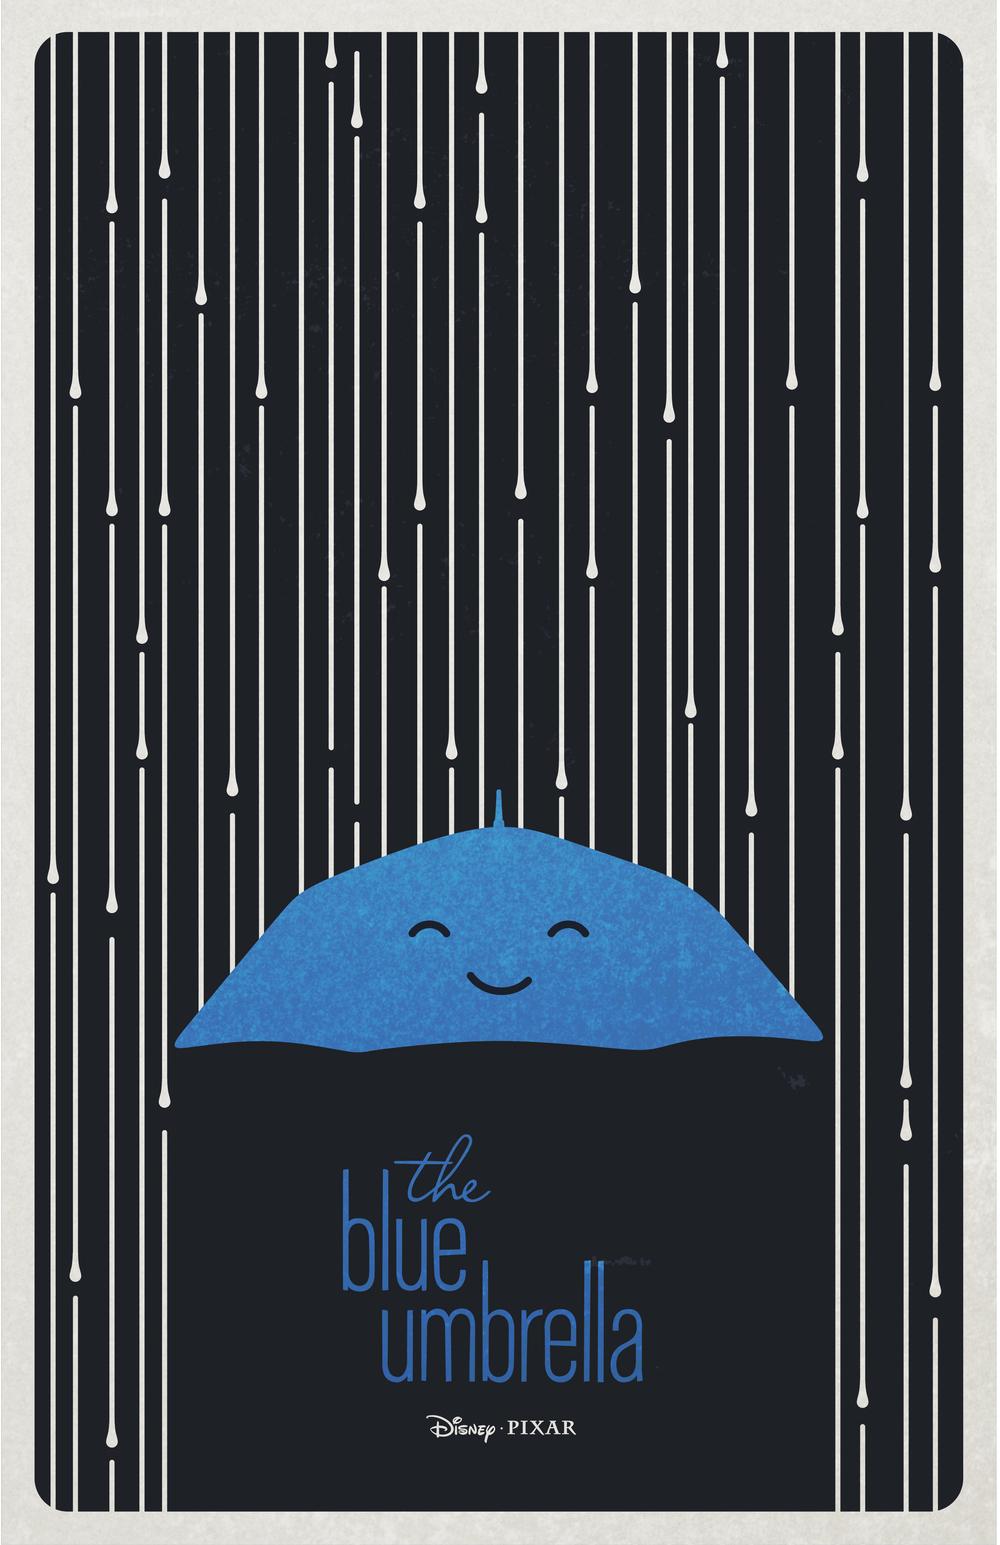 UmbrellaPoster_01-03.jpg